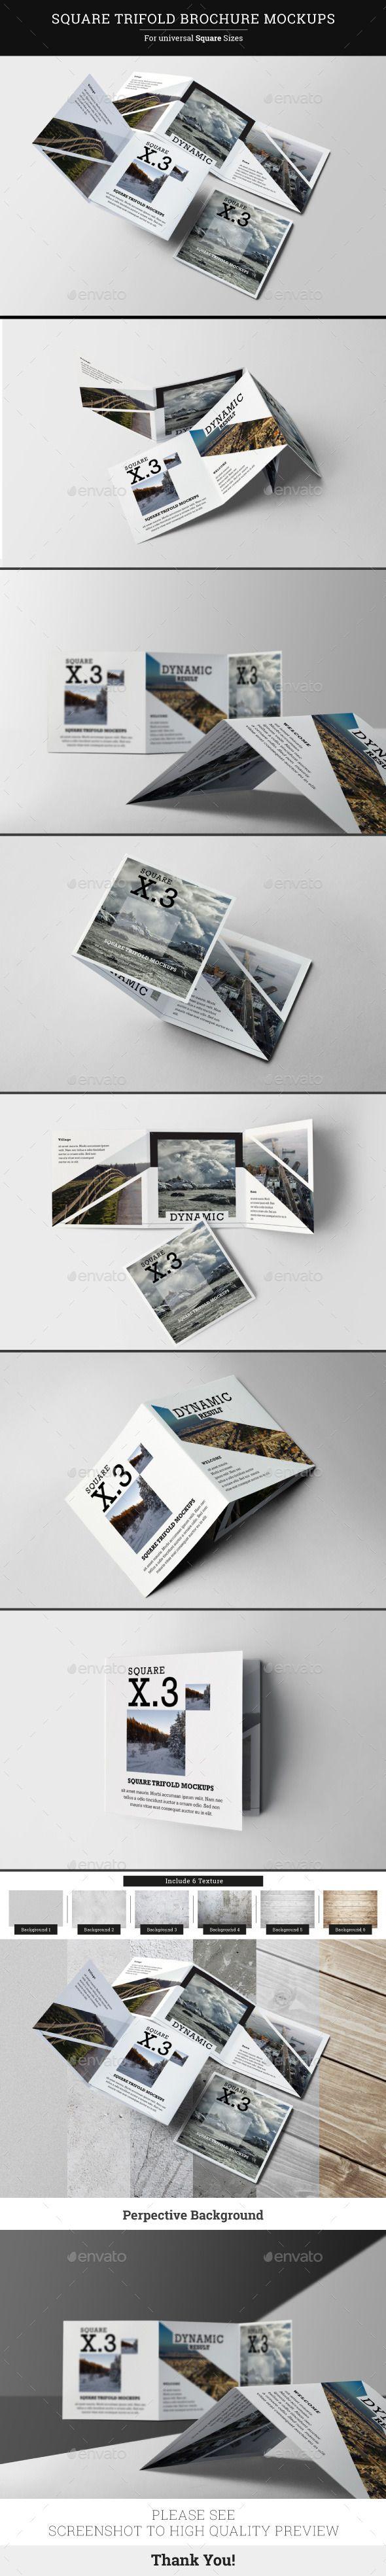 Square Trifold Brochure Mockups  #flyer #flyer mockup #folded #greeting card #identity #$7